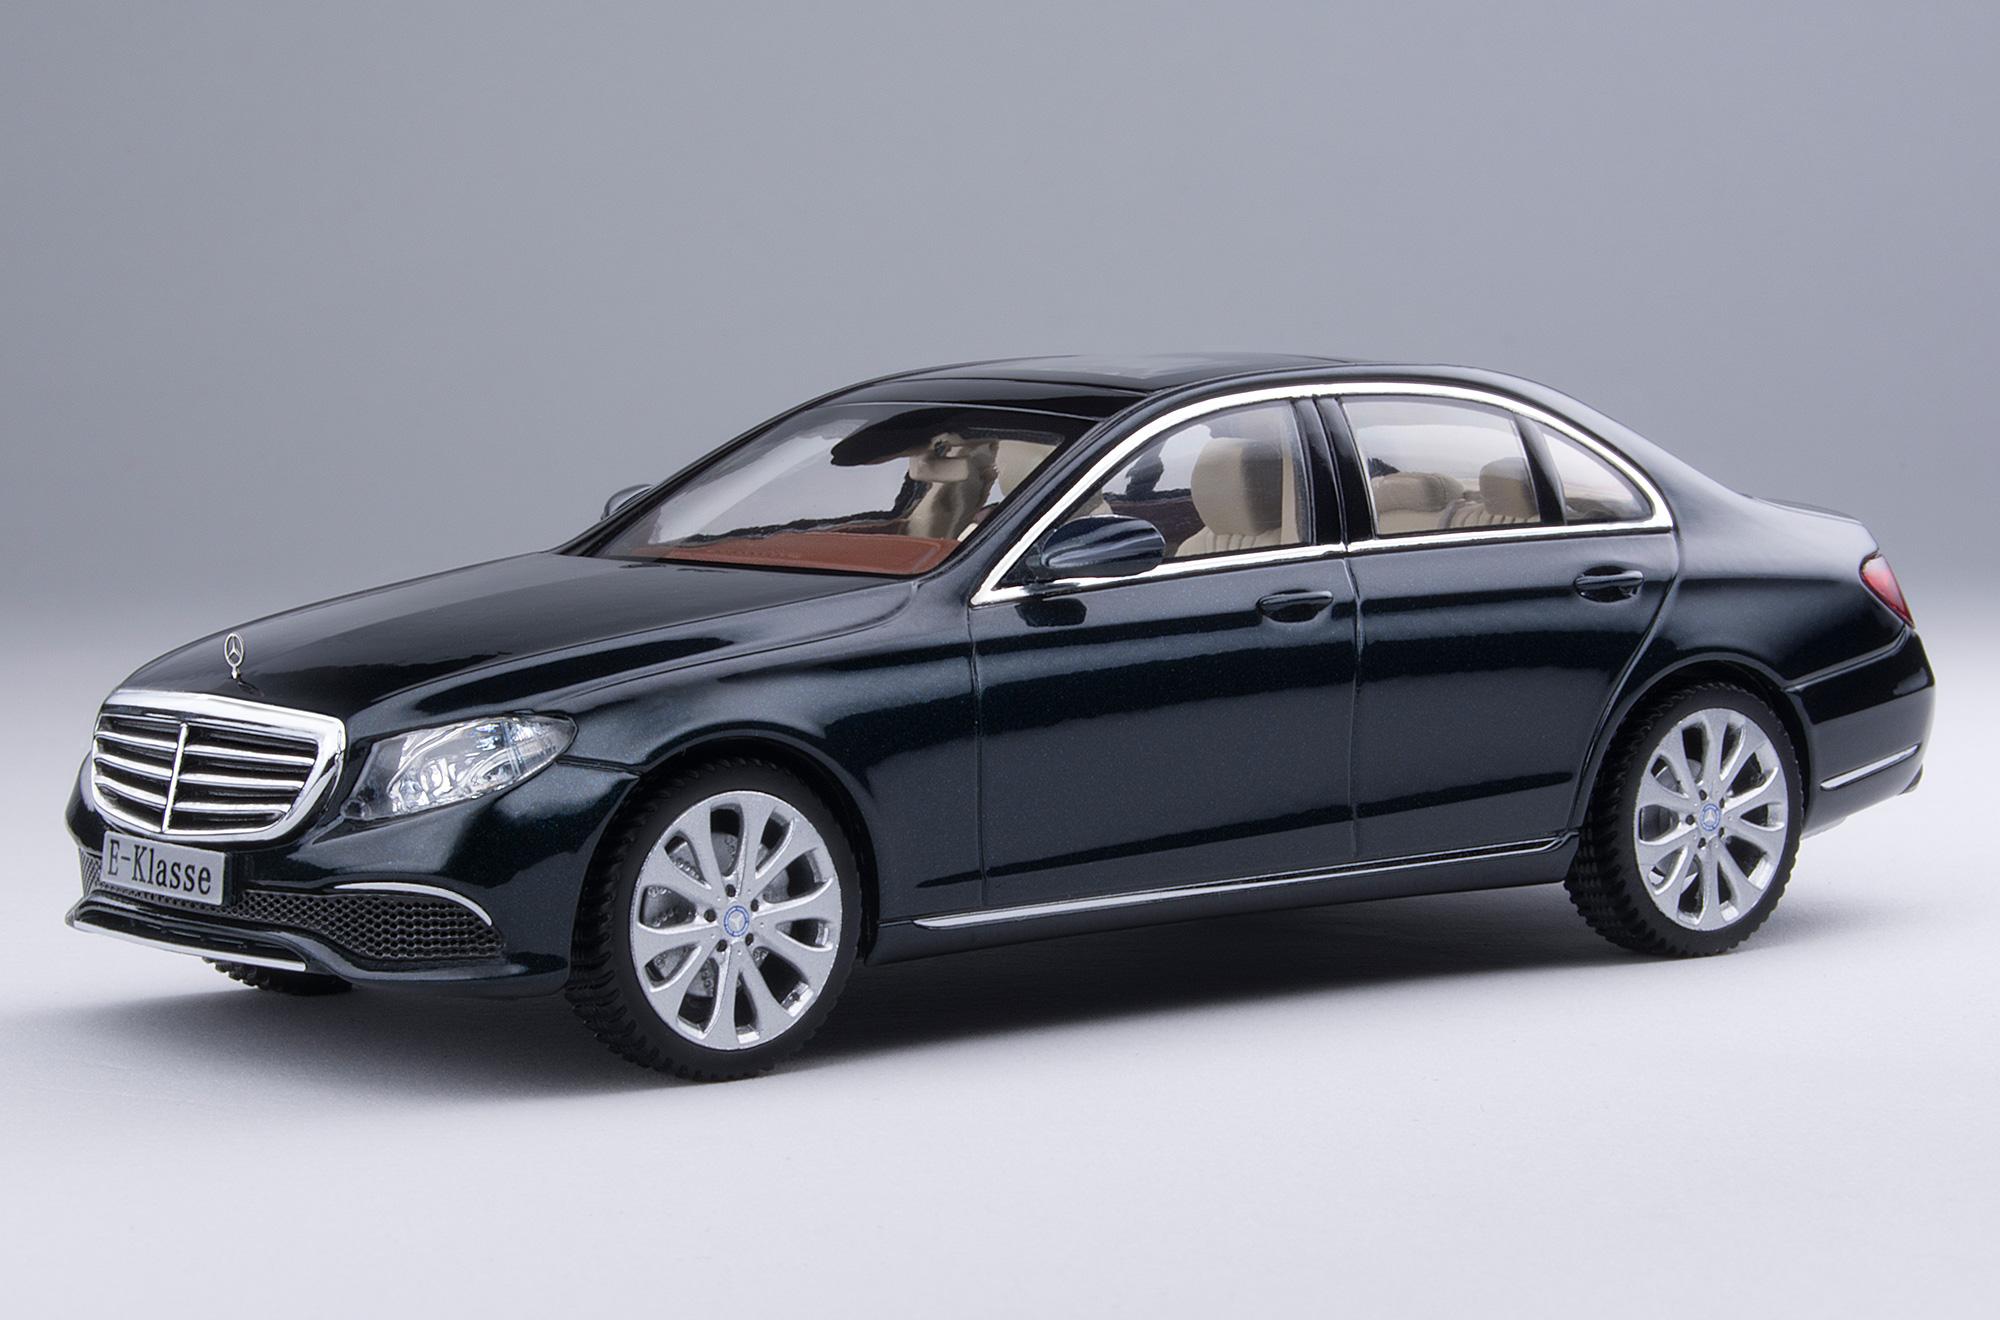 iScale MERCEDES E Klasse Limousine Elegance schwarz